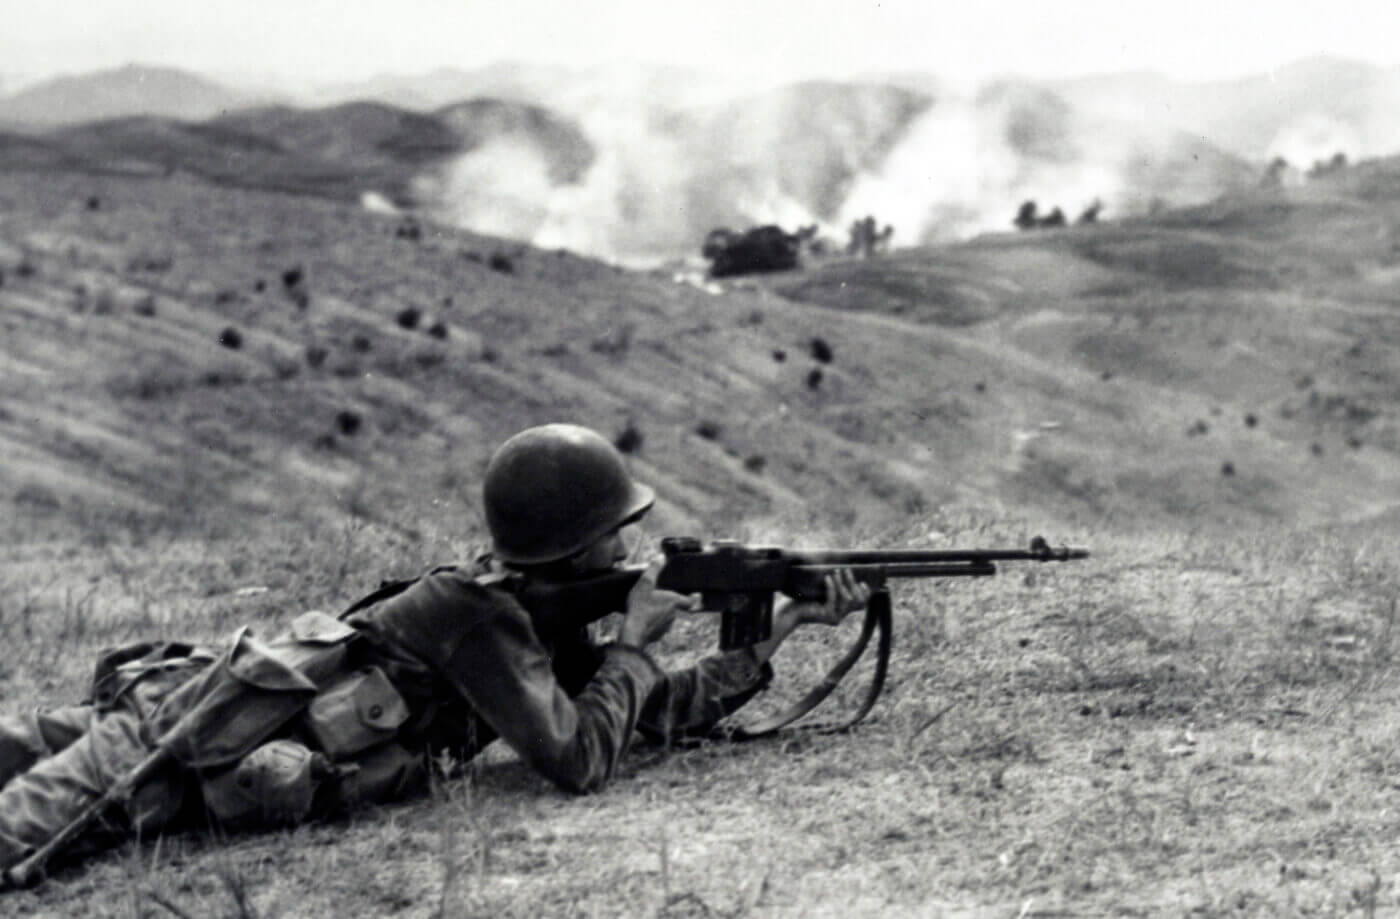 BAR shot from a hilltop in the Korean War